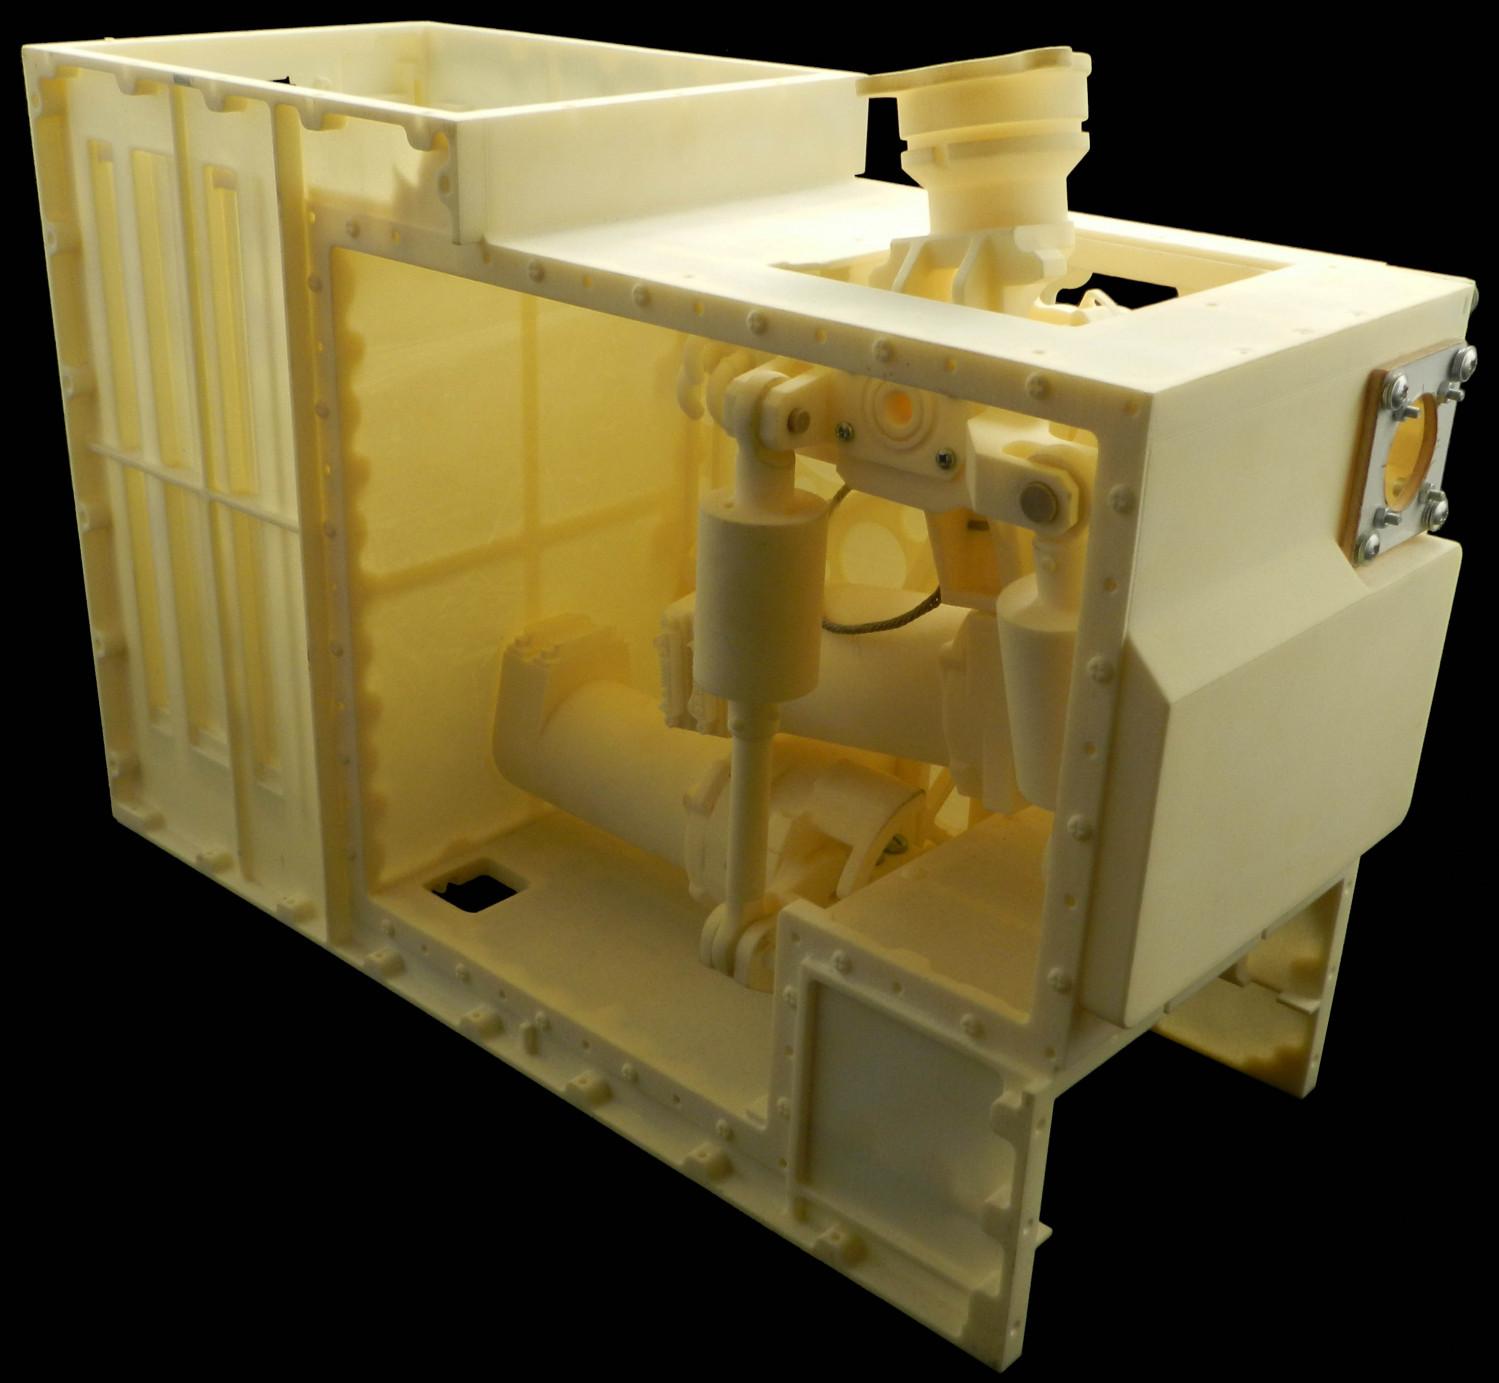 3D-Printed Control Stick Mechanism (model)